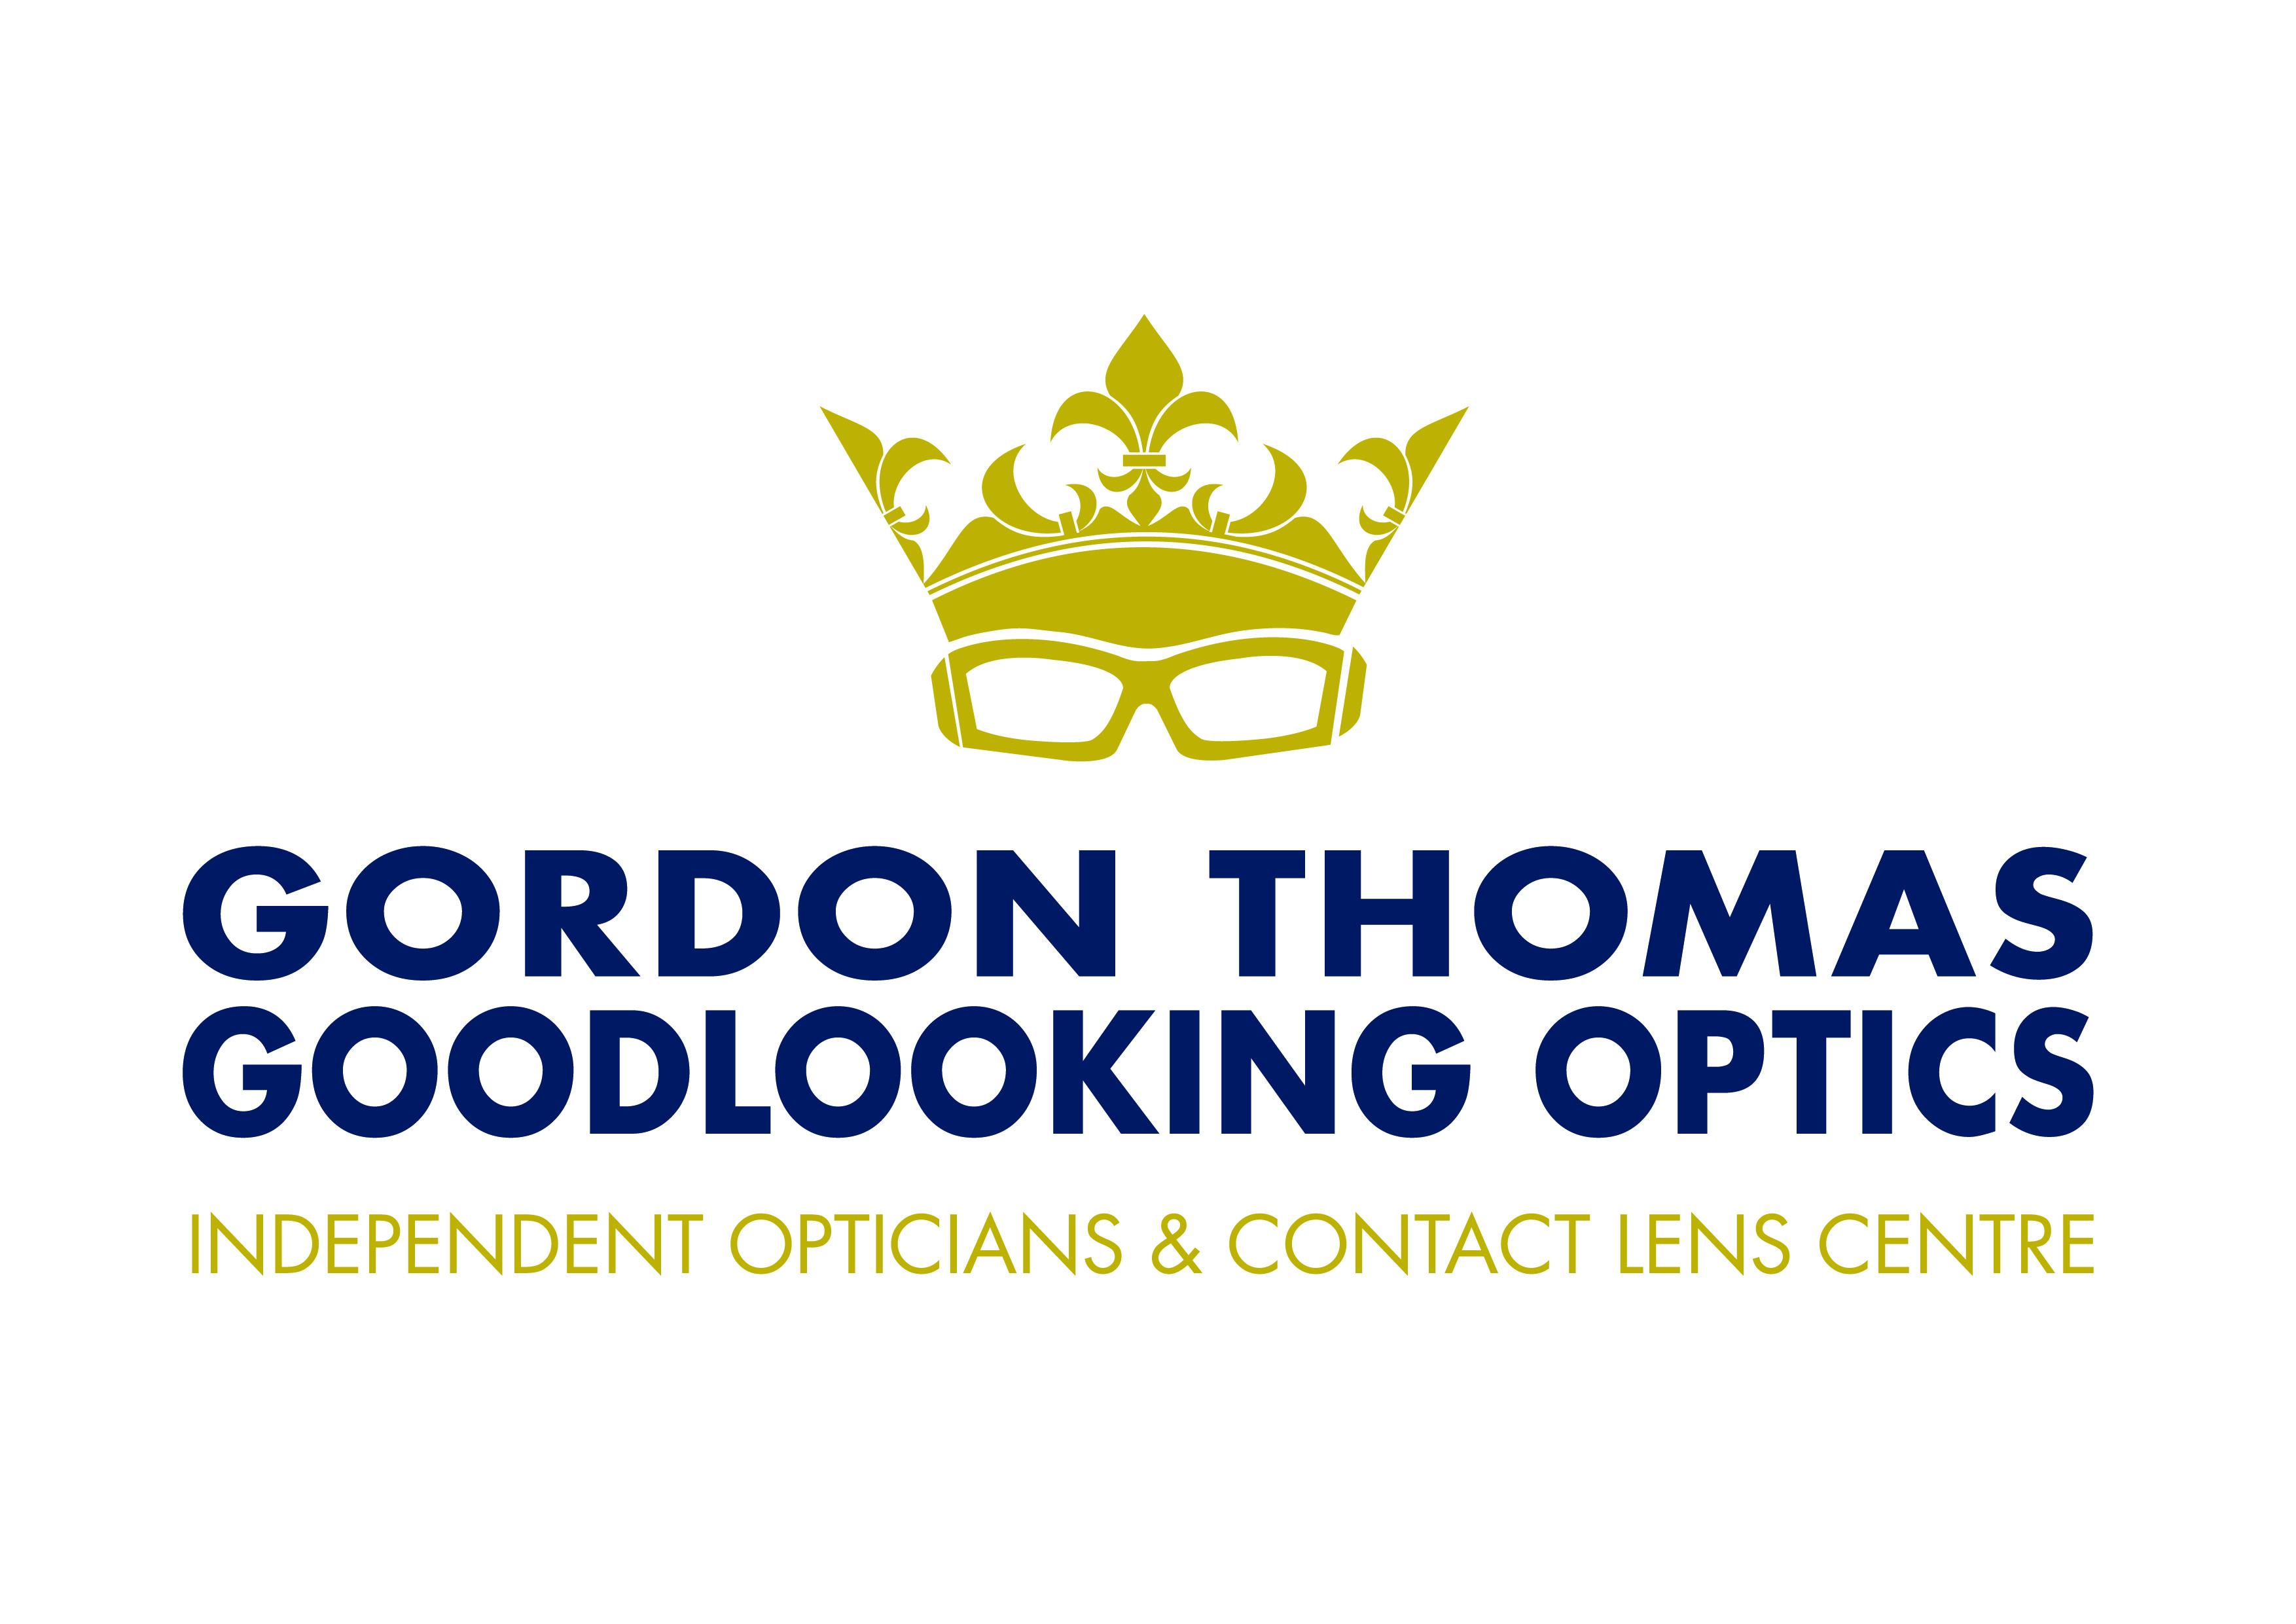 Opticians Enfield (Gordon Thomas) Excellence in Eye Care Since 1947